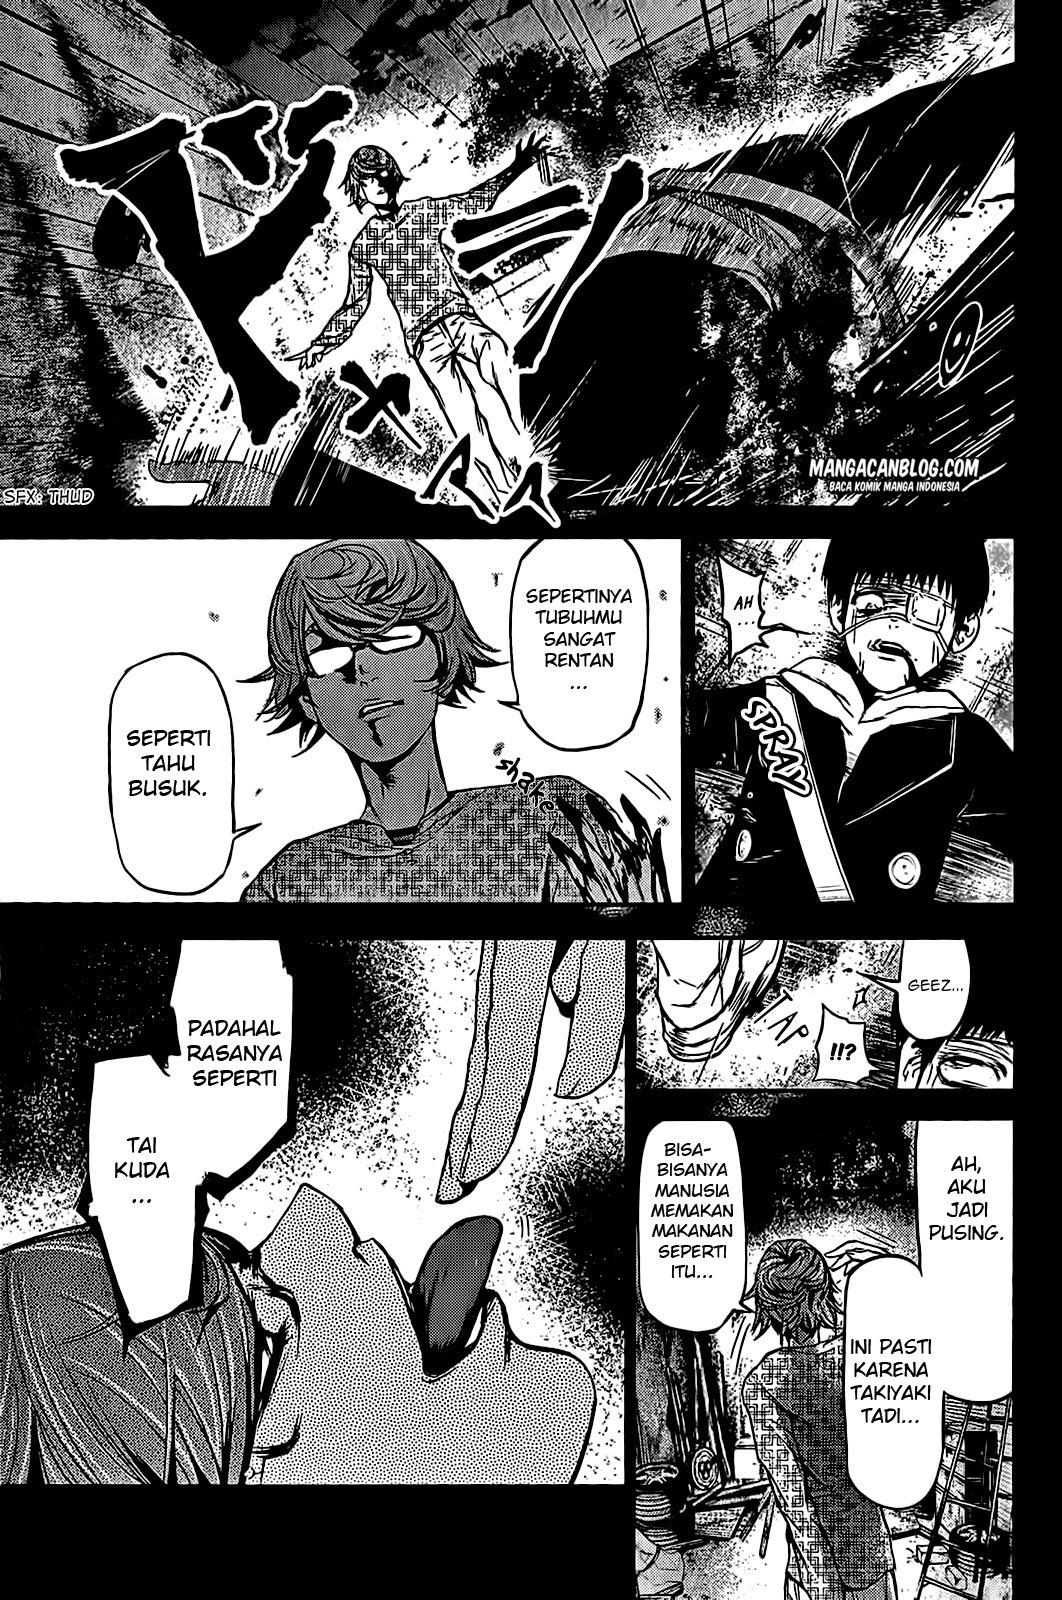 Dilarang COPAS - situs resmi www.mangacanblog.com - Komik tokyo ghoul 007 - tipu muslihat 8 Indonesia tokyo ghoul 007 - tipu muslihat Terbaru 16|Baca Manga Komik Indonesia|Mangacan